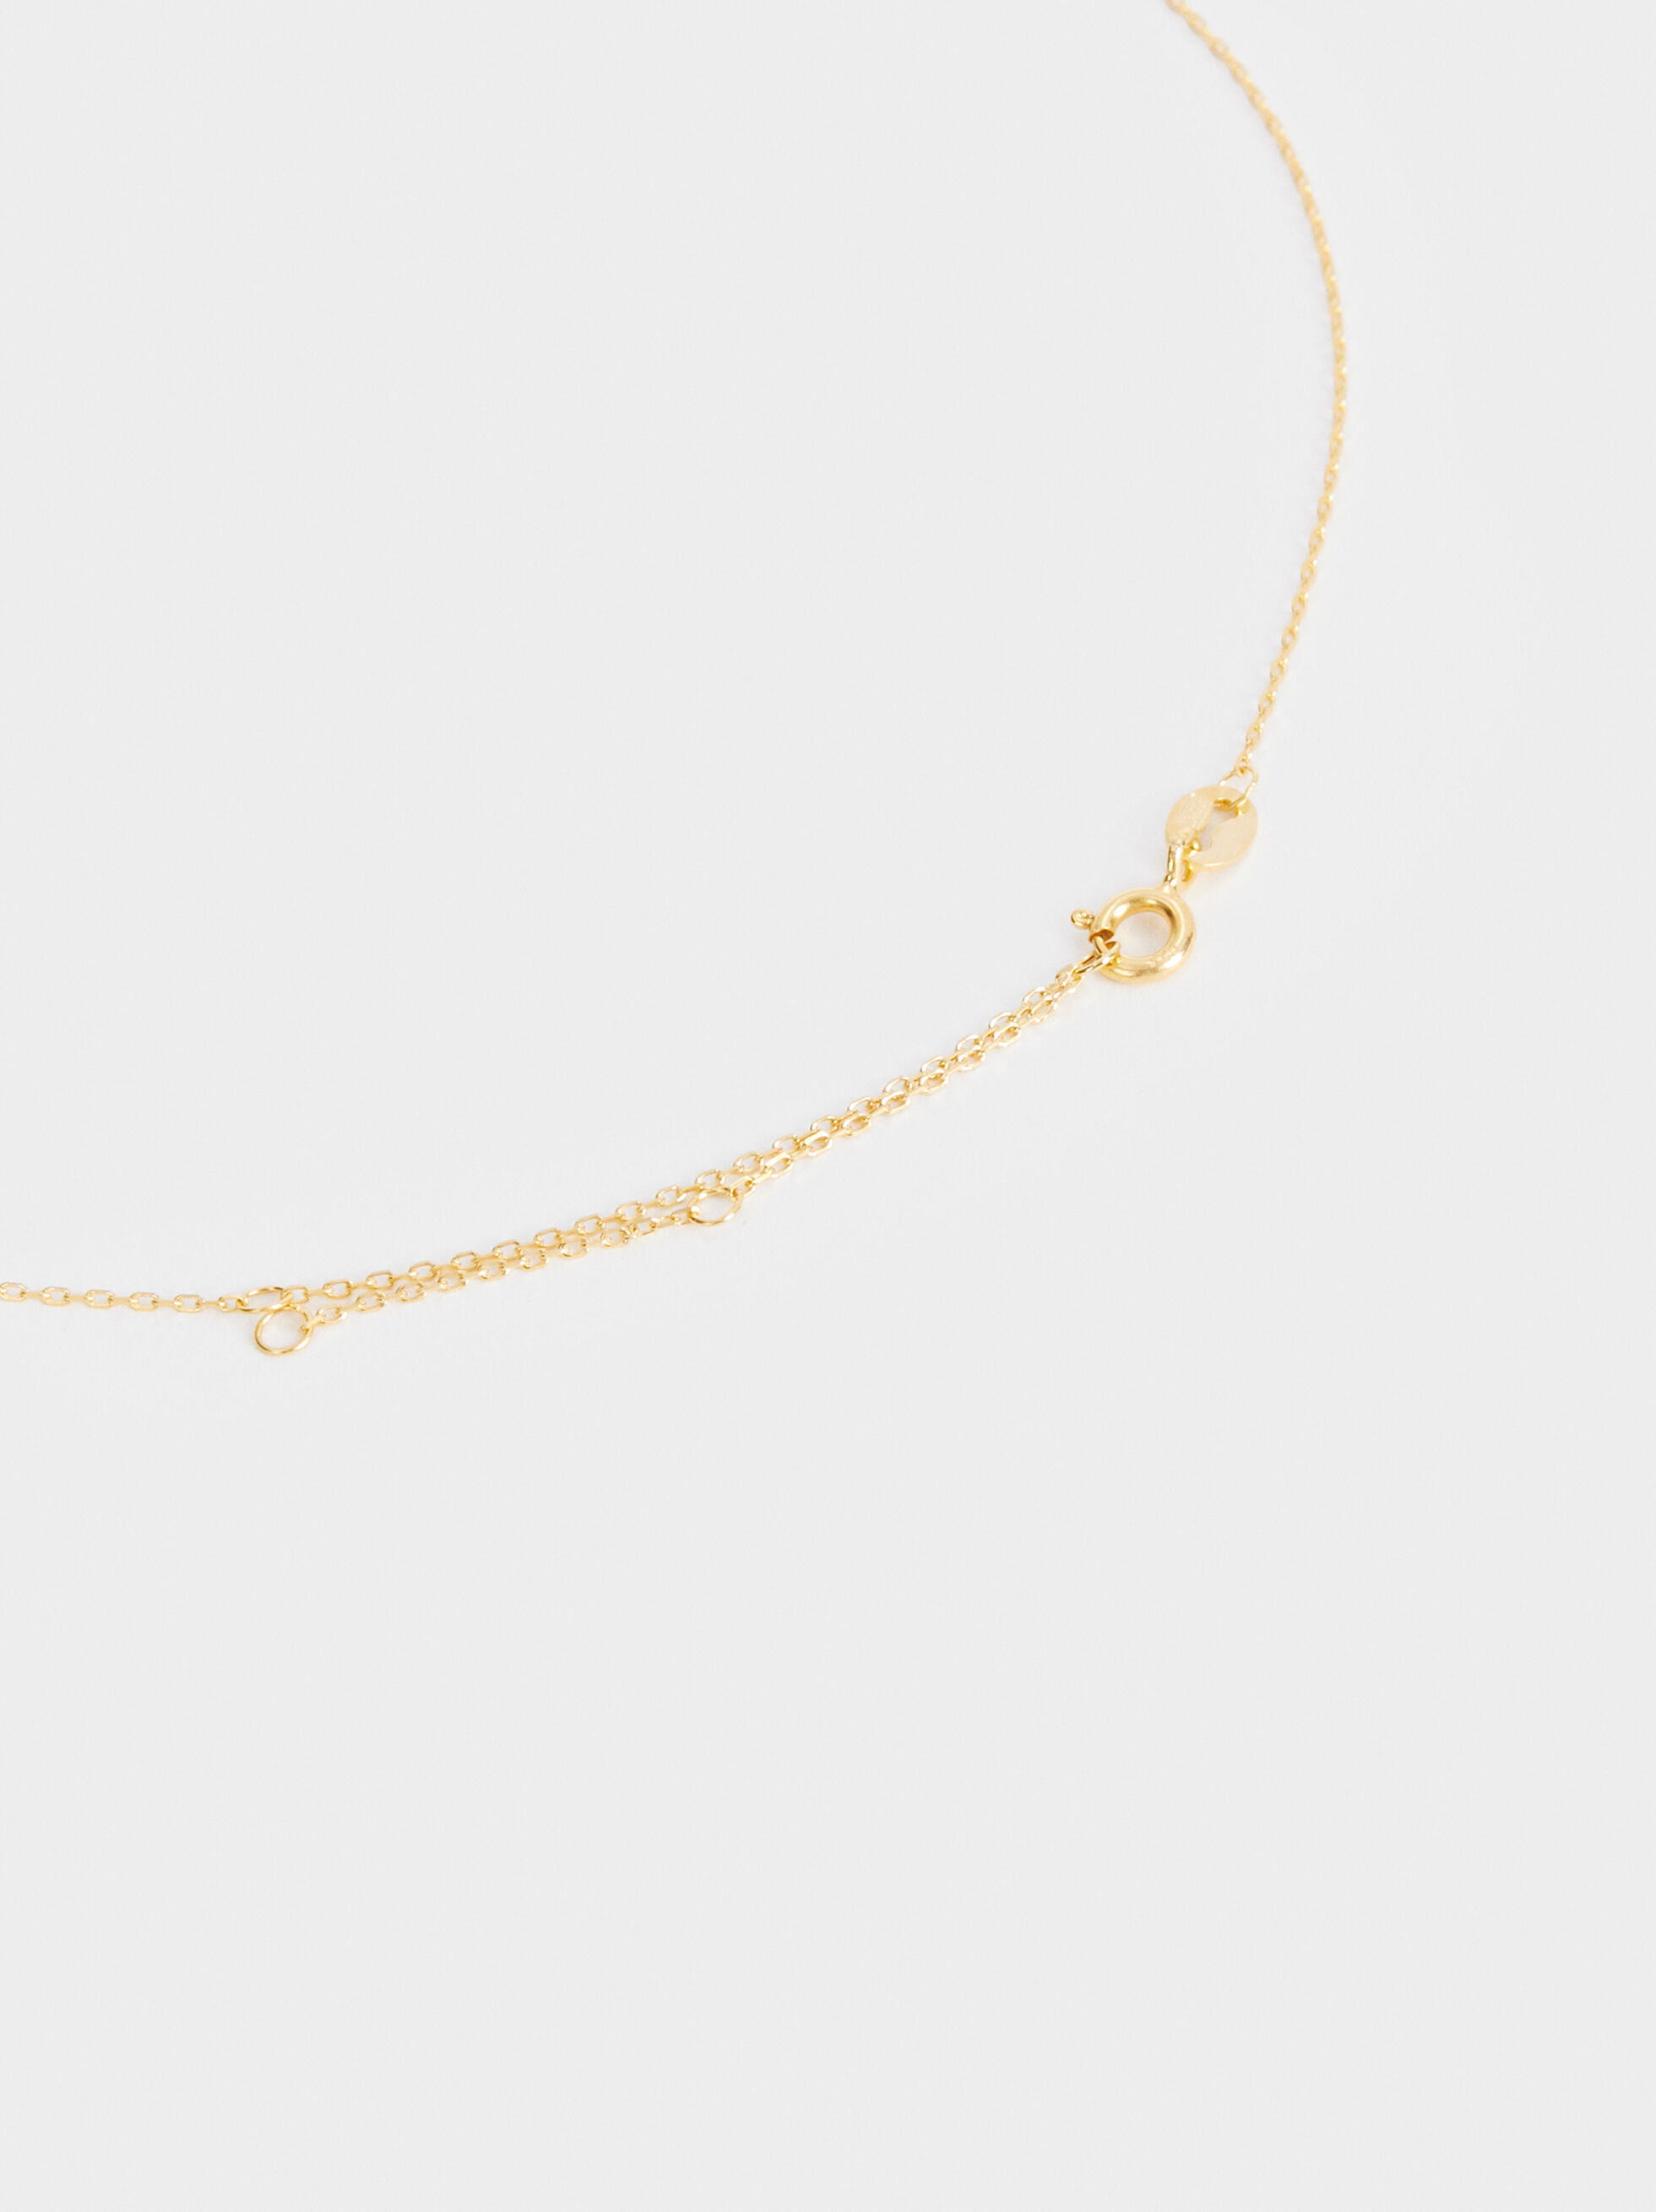 Short 925 Silver Tree Necklace, Golden, hi-res